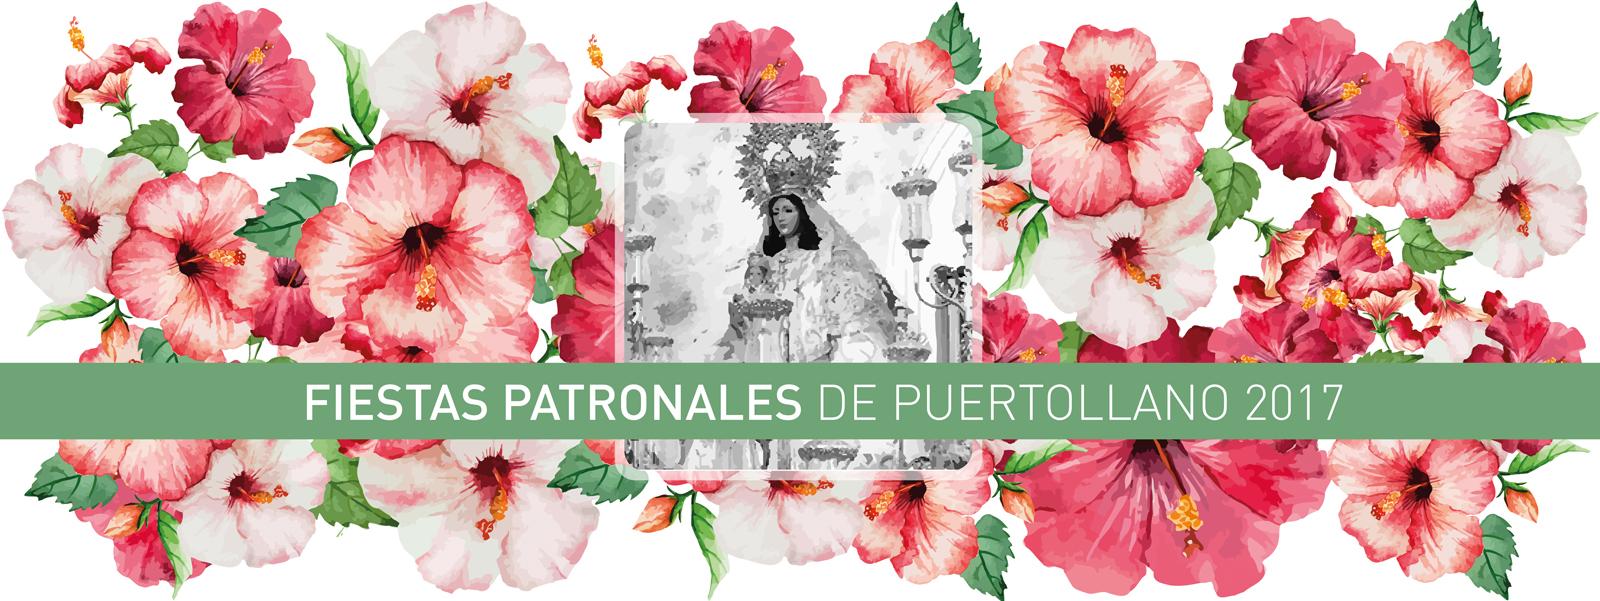 Fiestas patronales Puertollano 2017